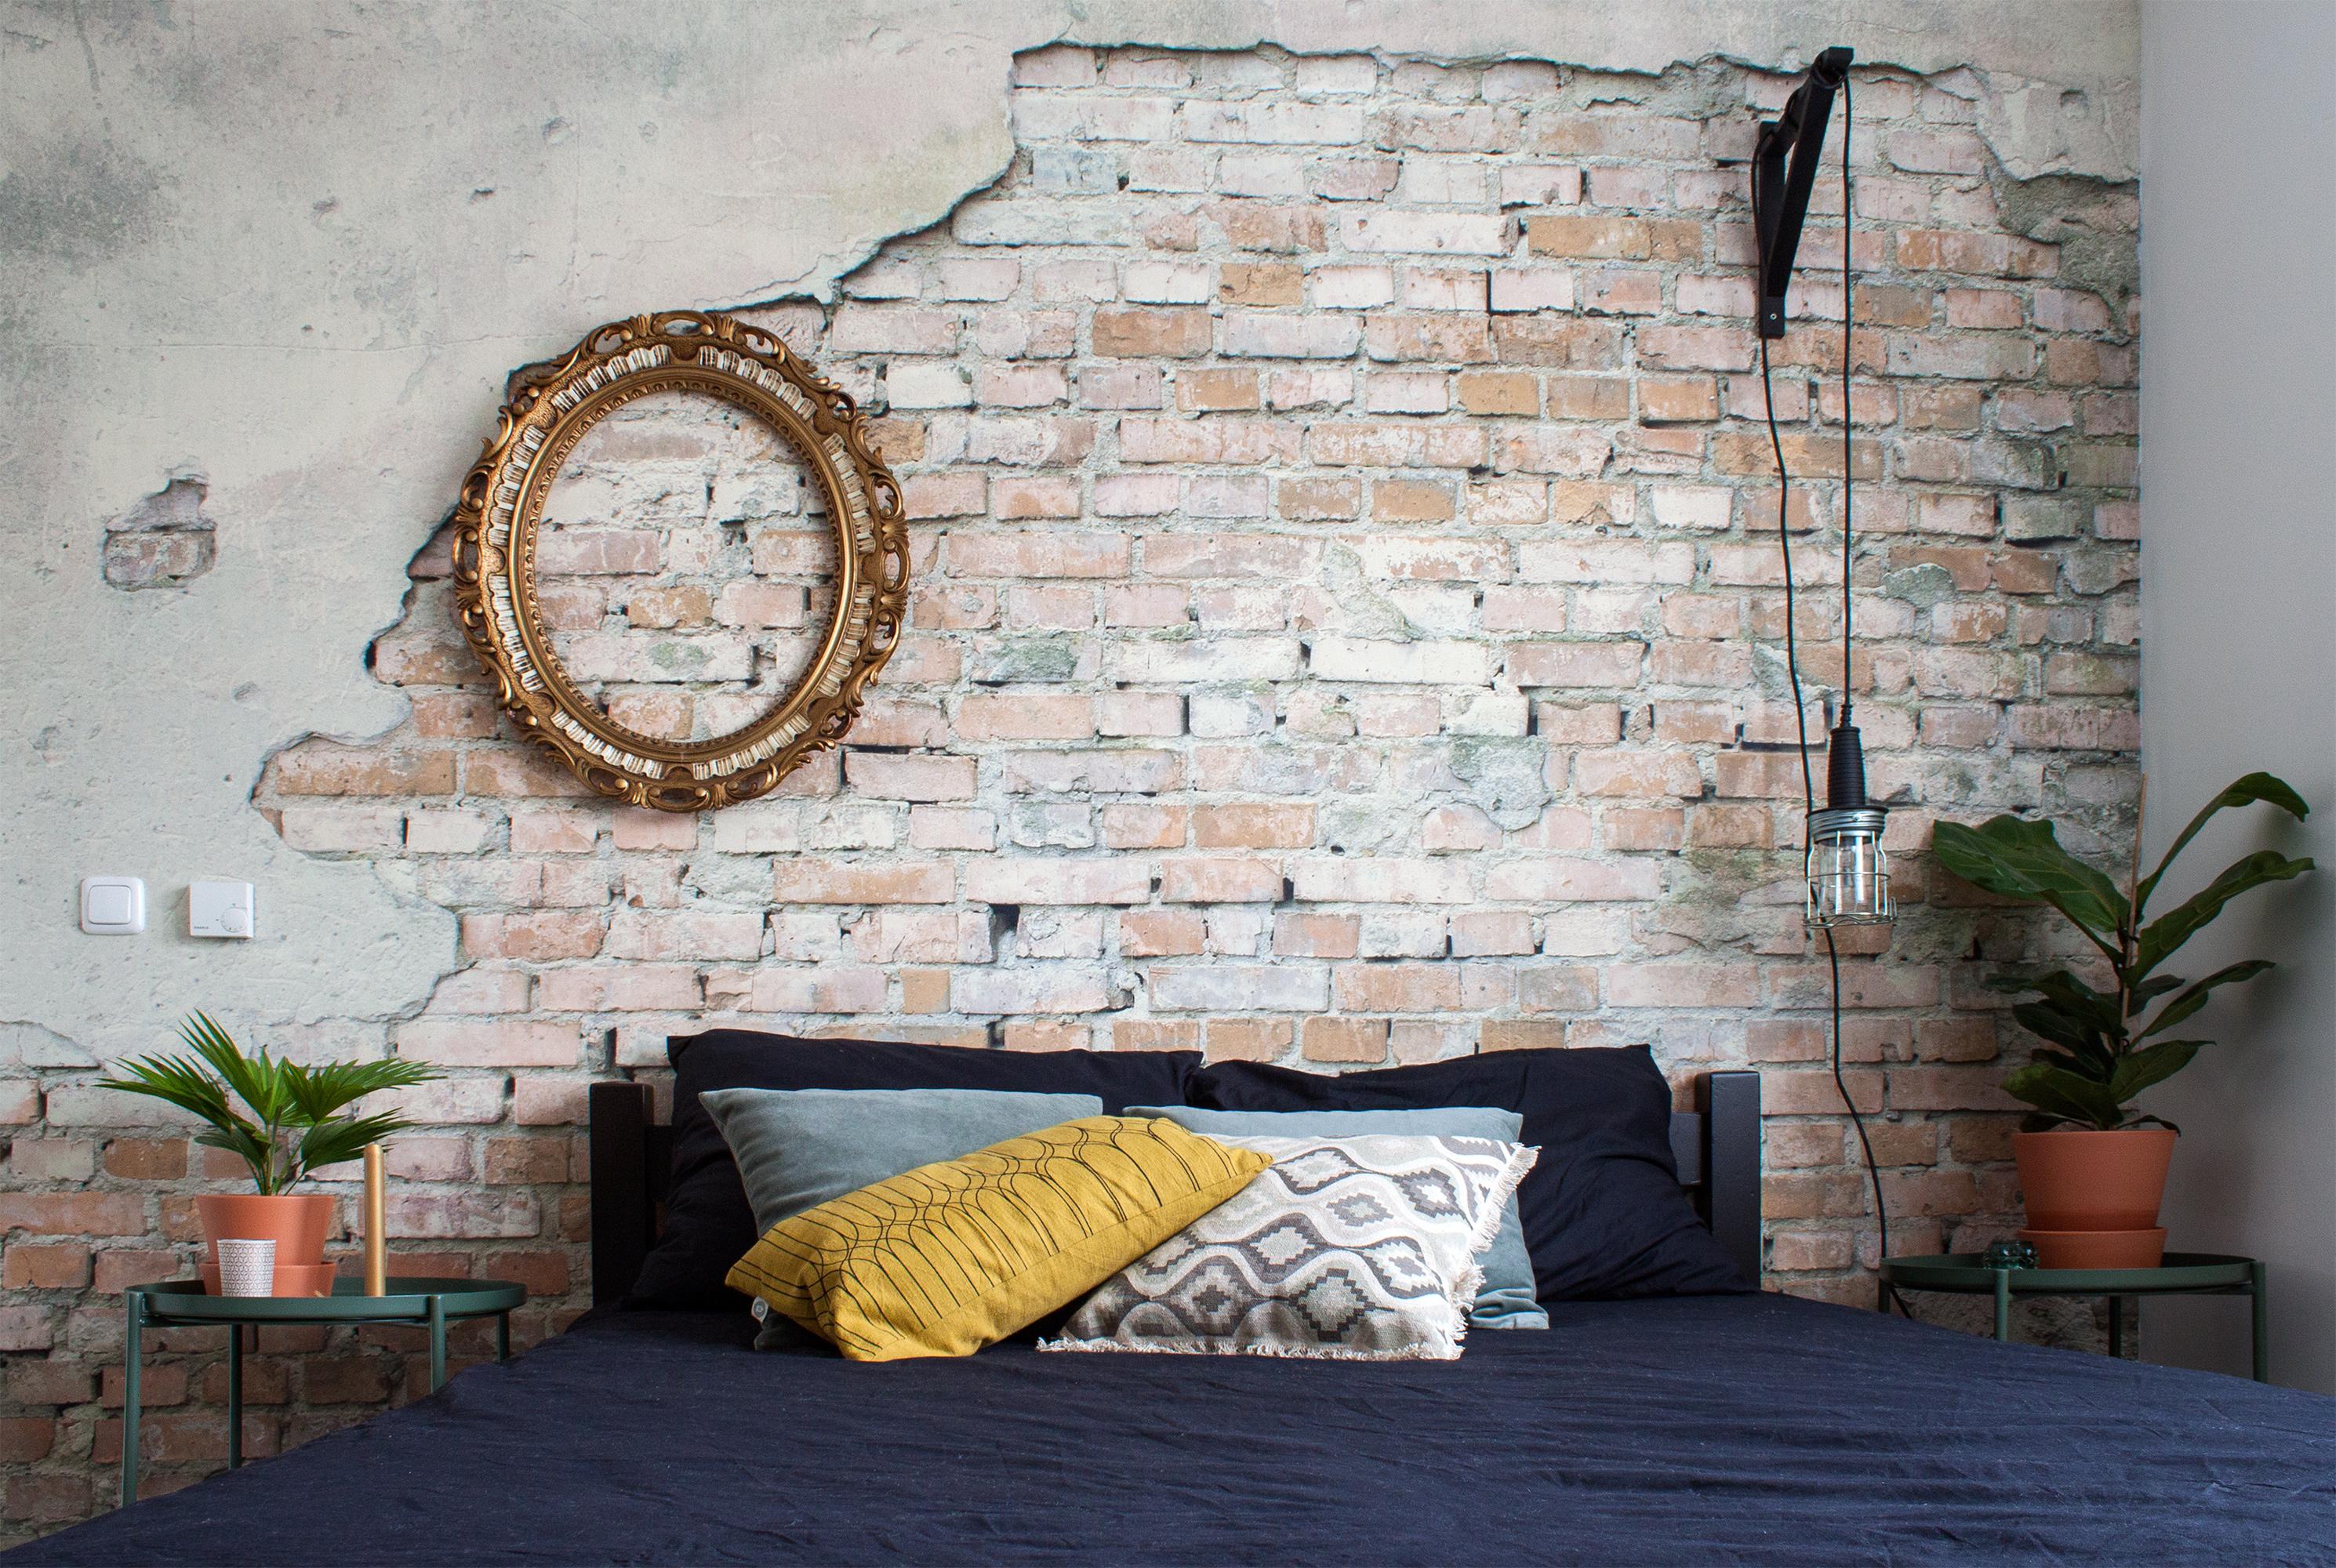 Lars Tv Meubel Karwei.House Tour A Warm Organic Modern Dutch Home Apartment Therapy